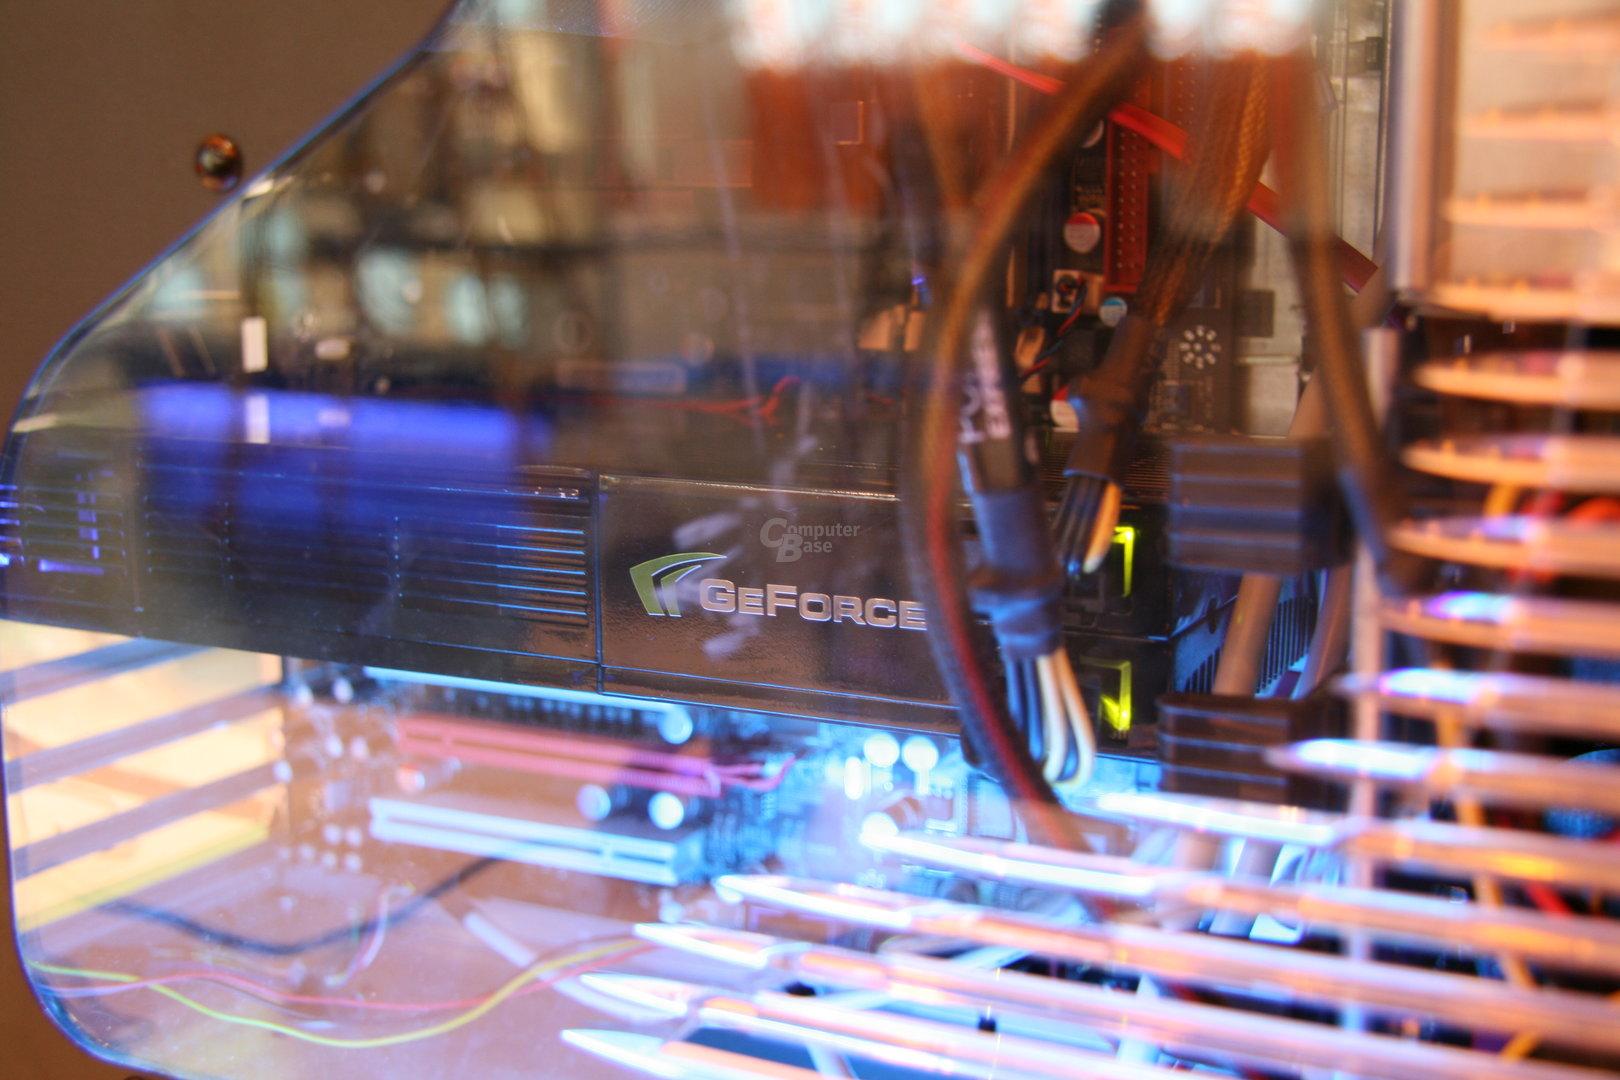 Foxconn GeForce 9800 GX2